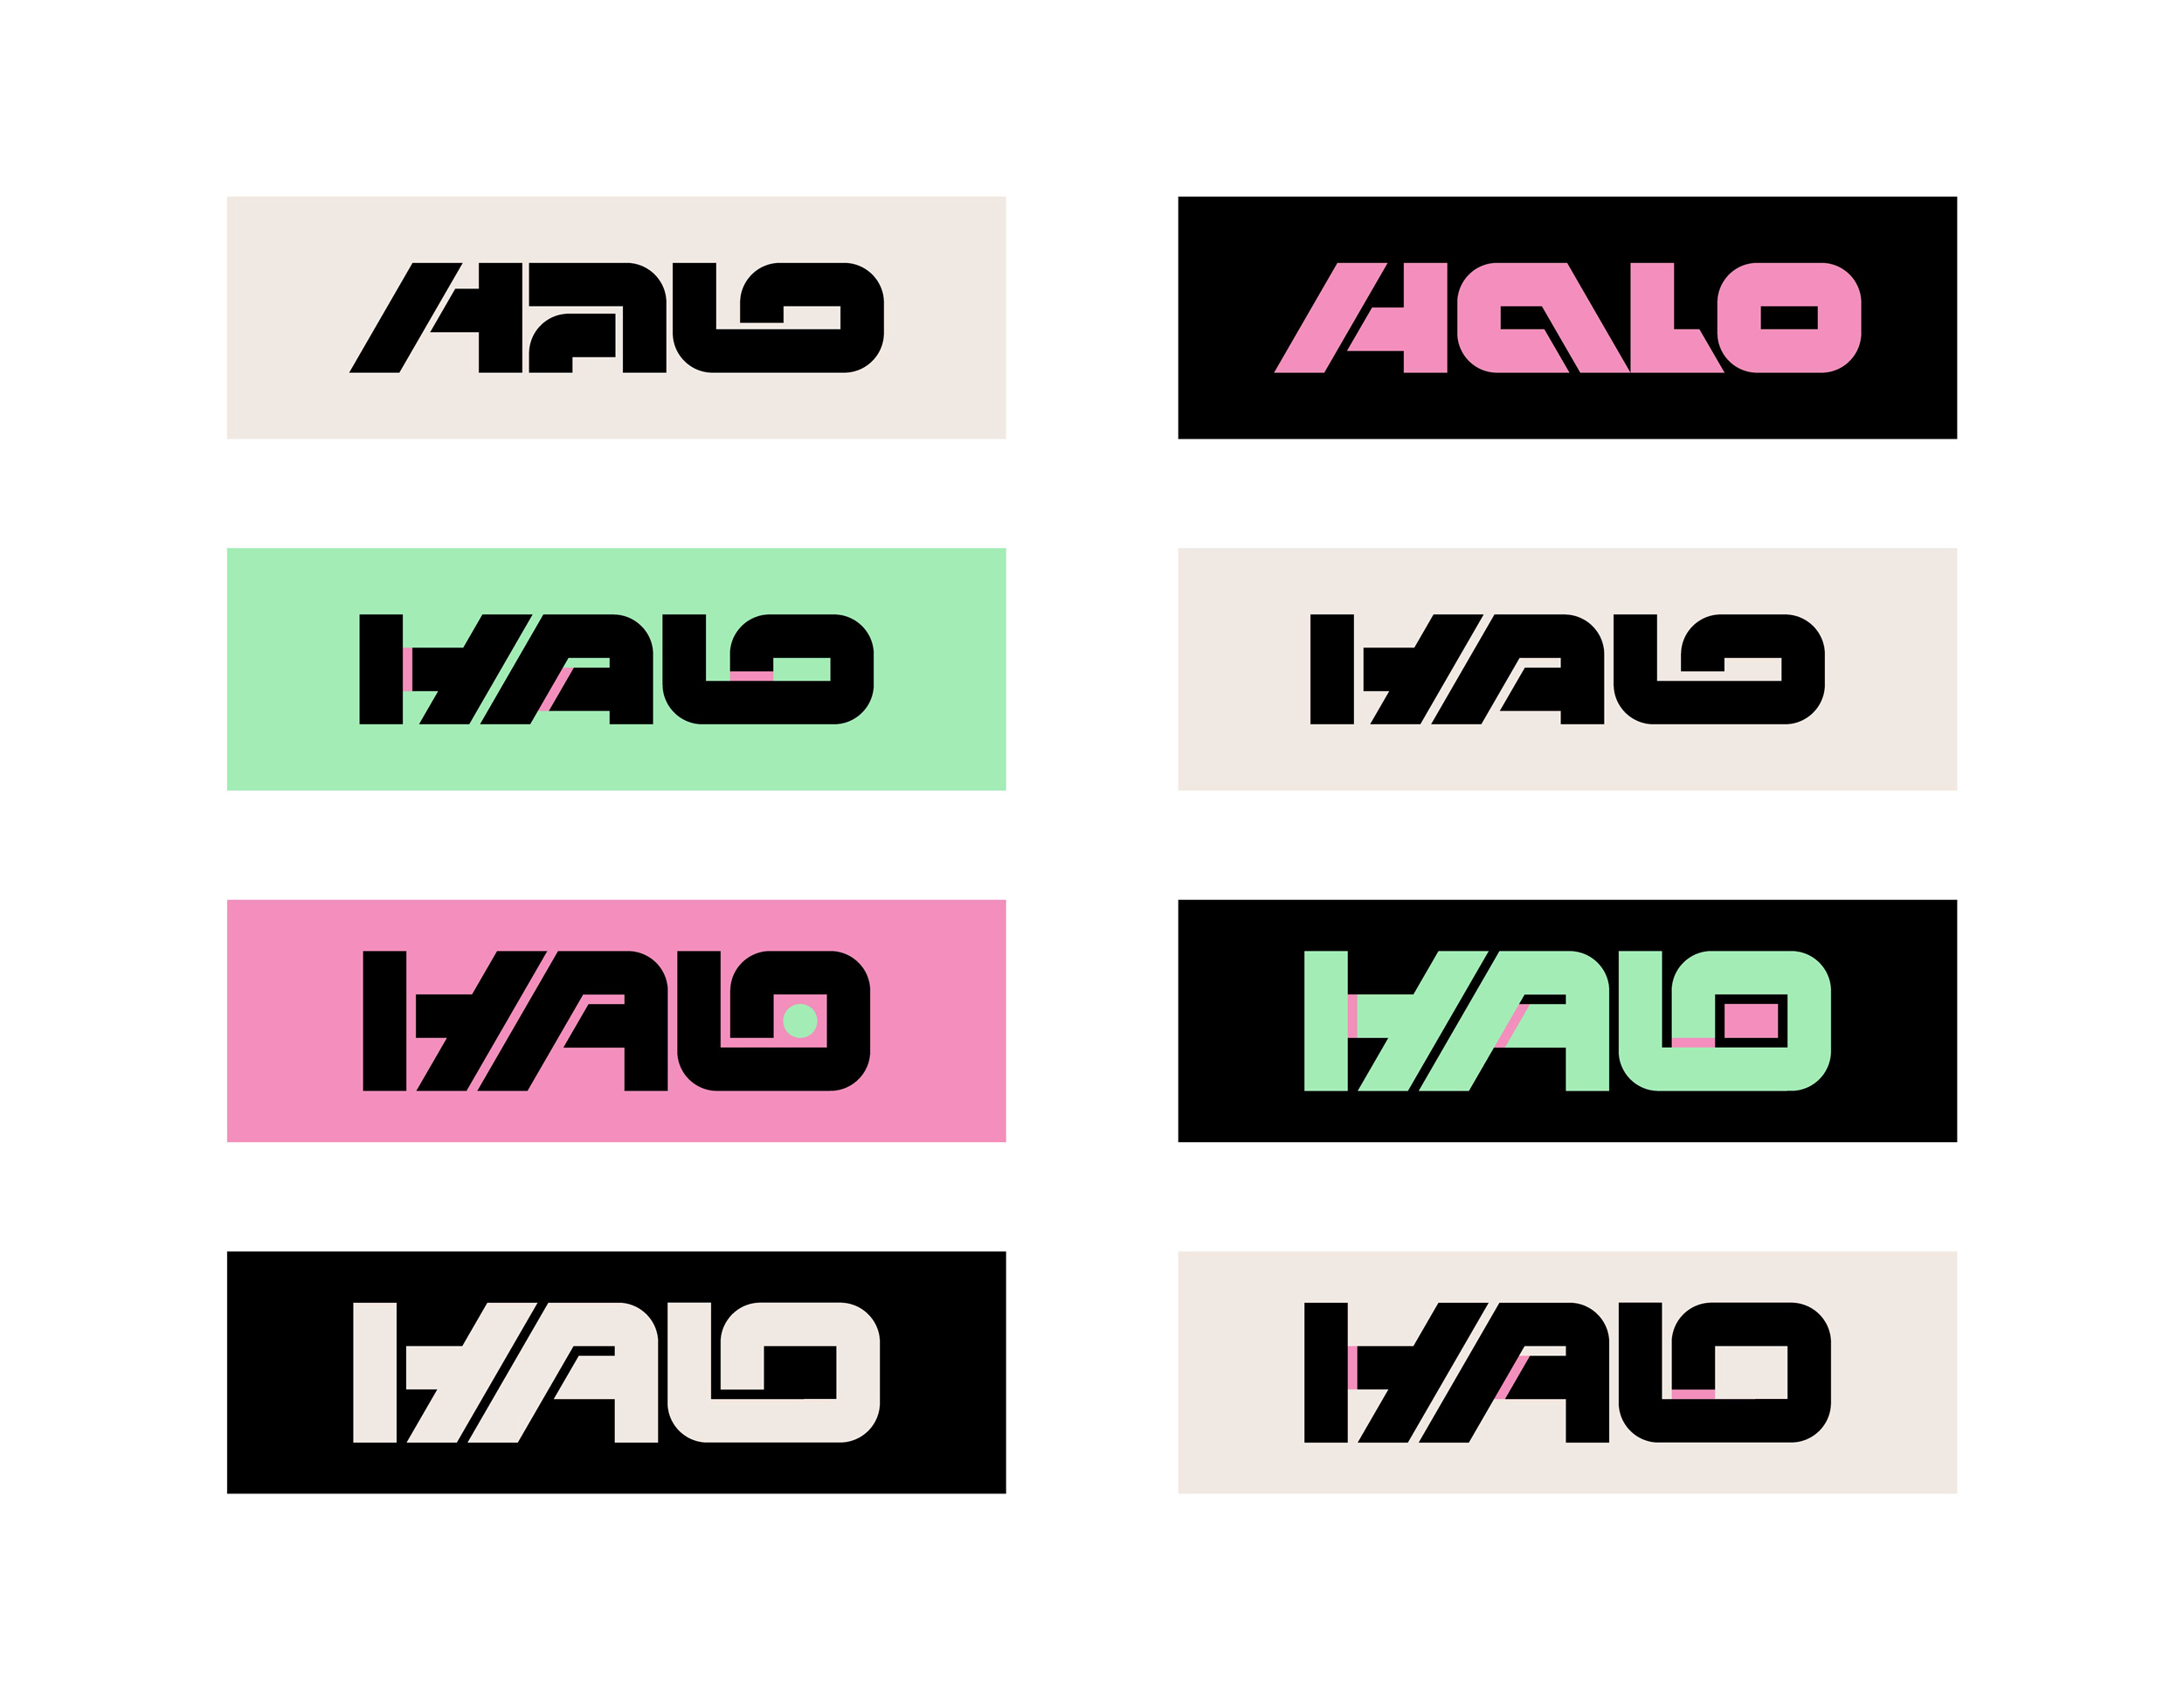 HALO_Justin-Harder_06.jpg